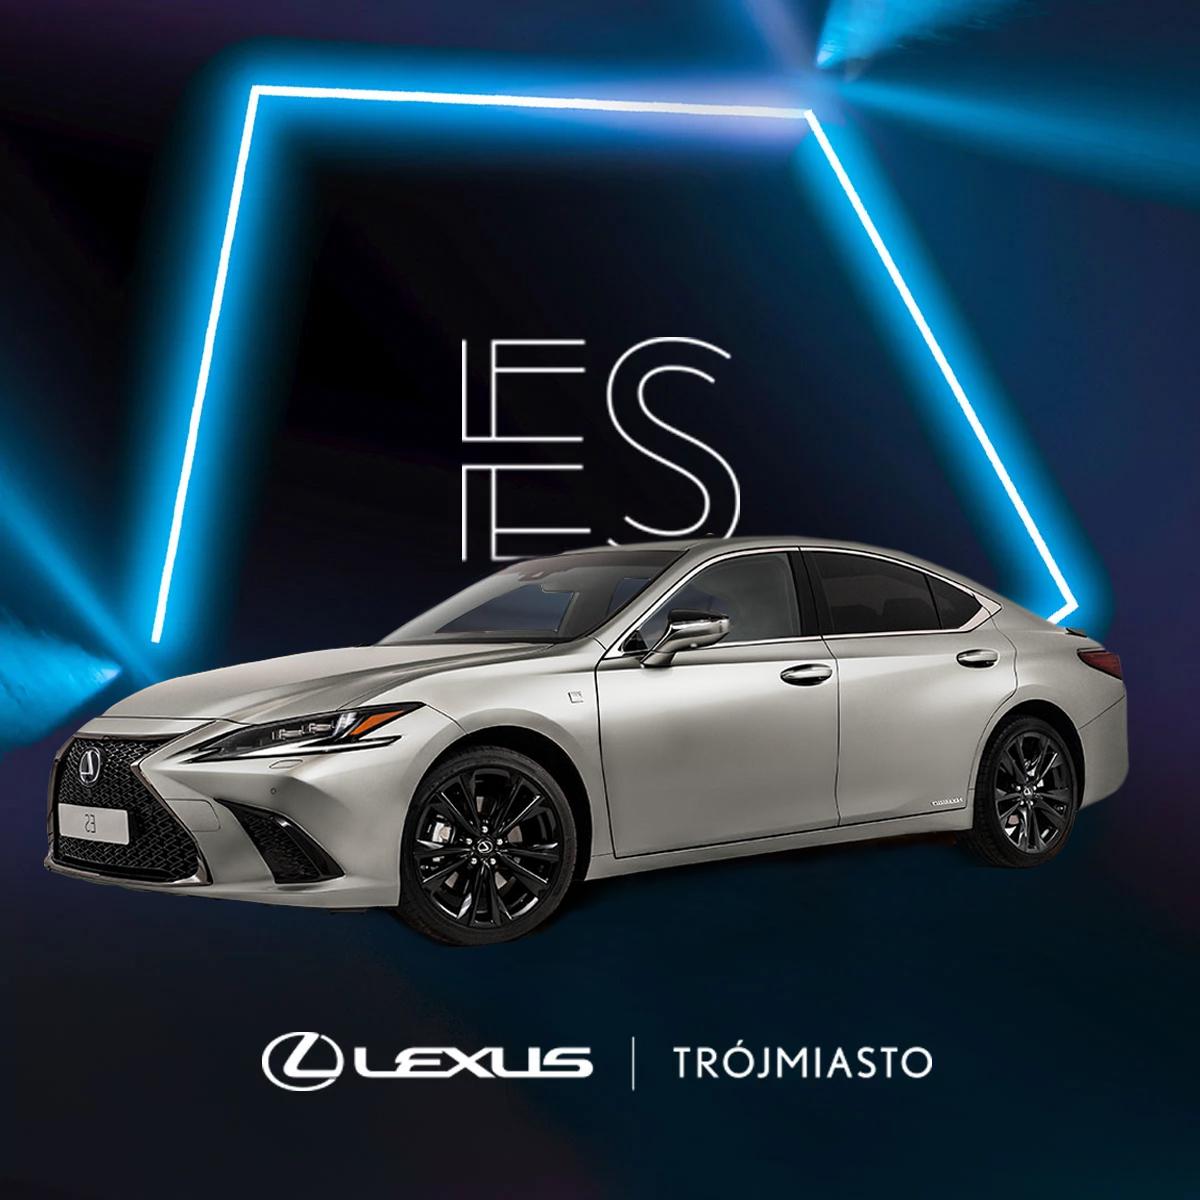 Lexus-ES-Trójmiasto